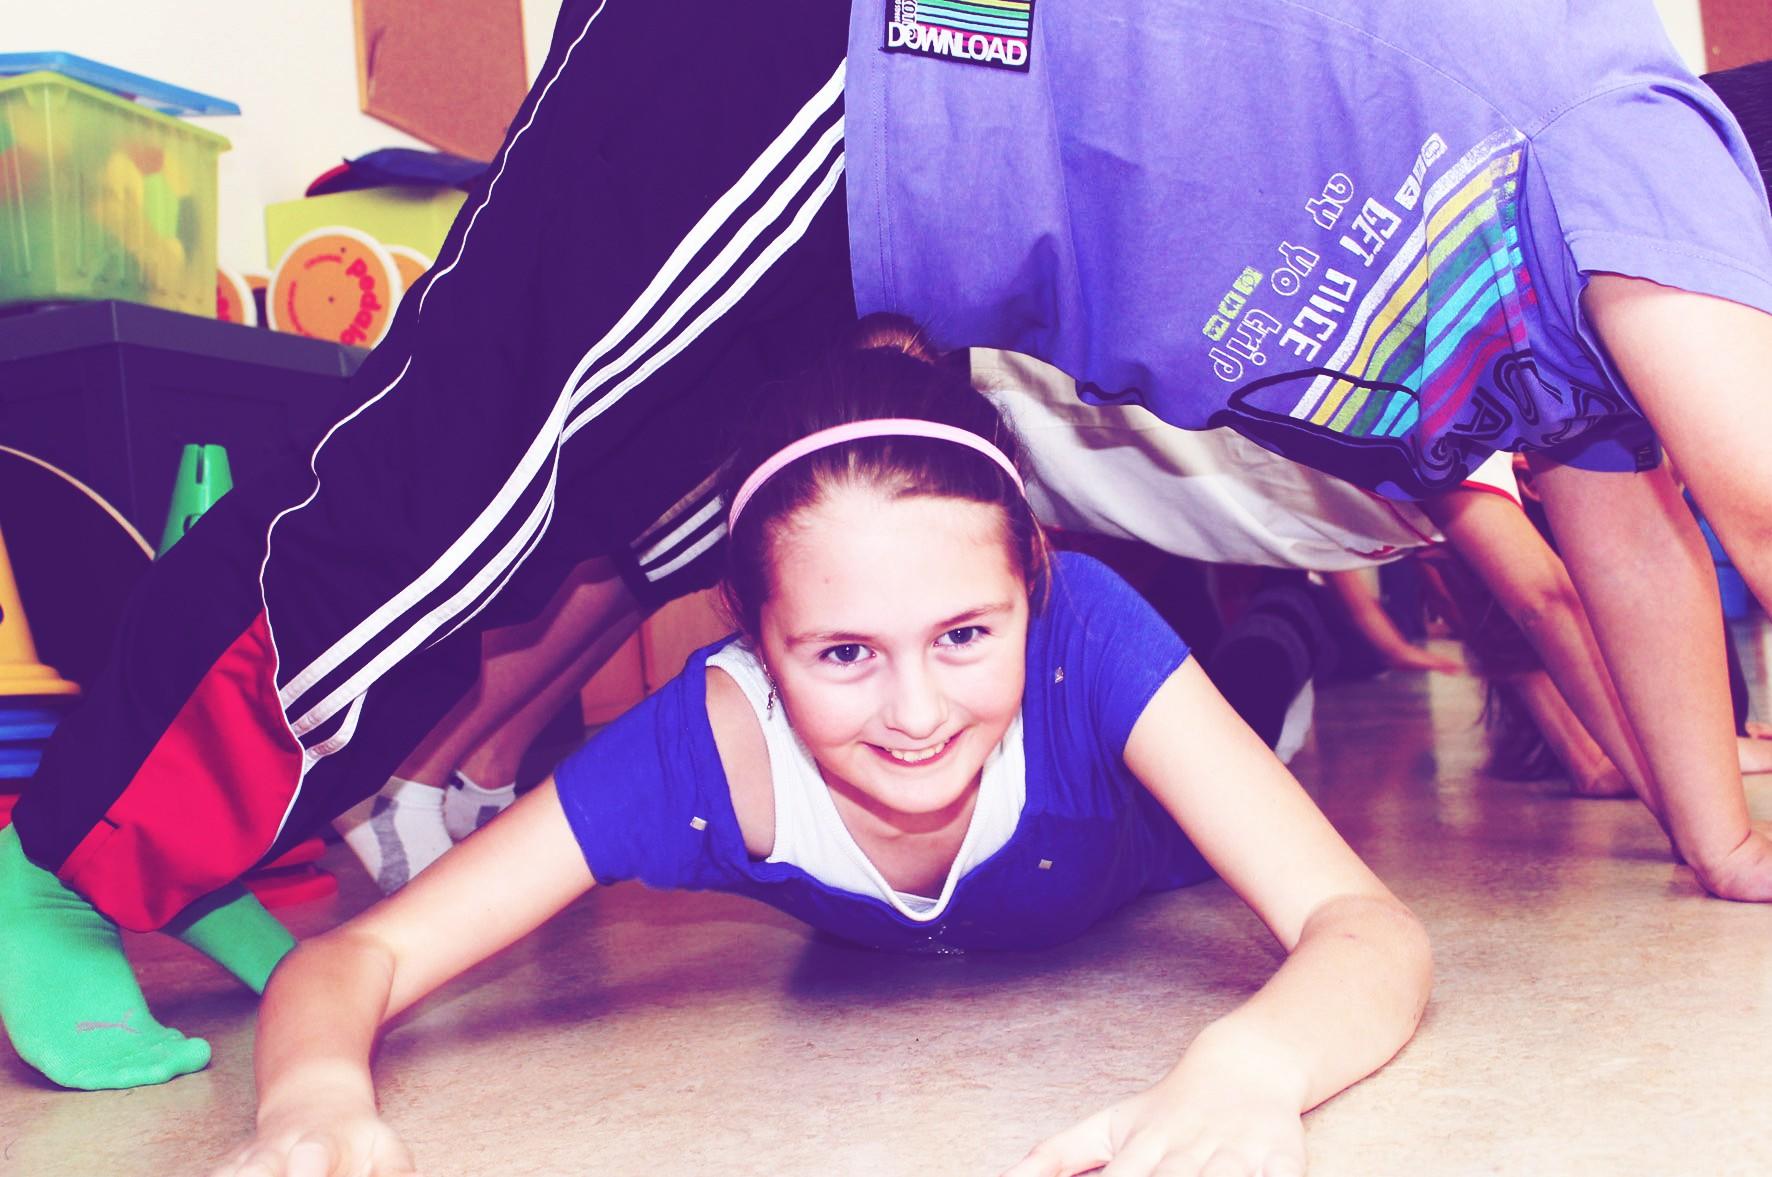 Kinderyoga ausbildung in wien yoga zeit das for Raumgestaltung yoga